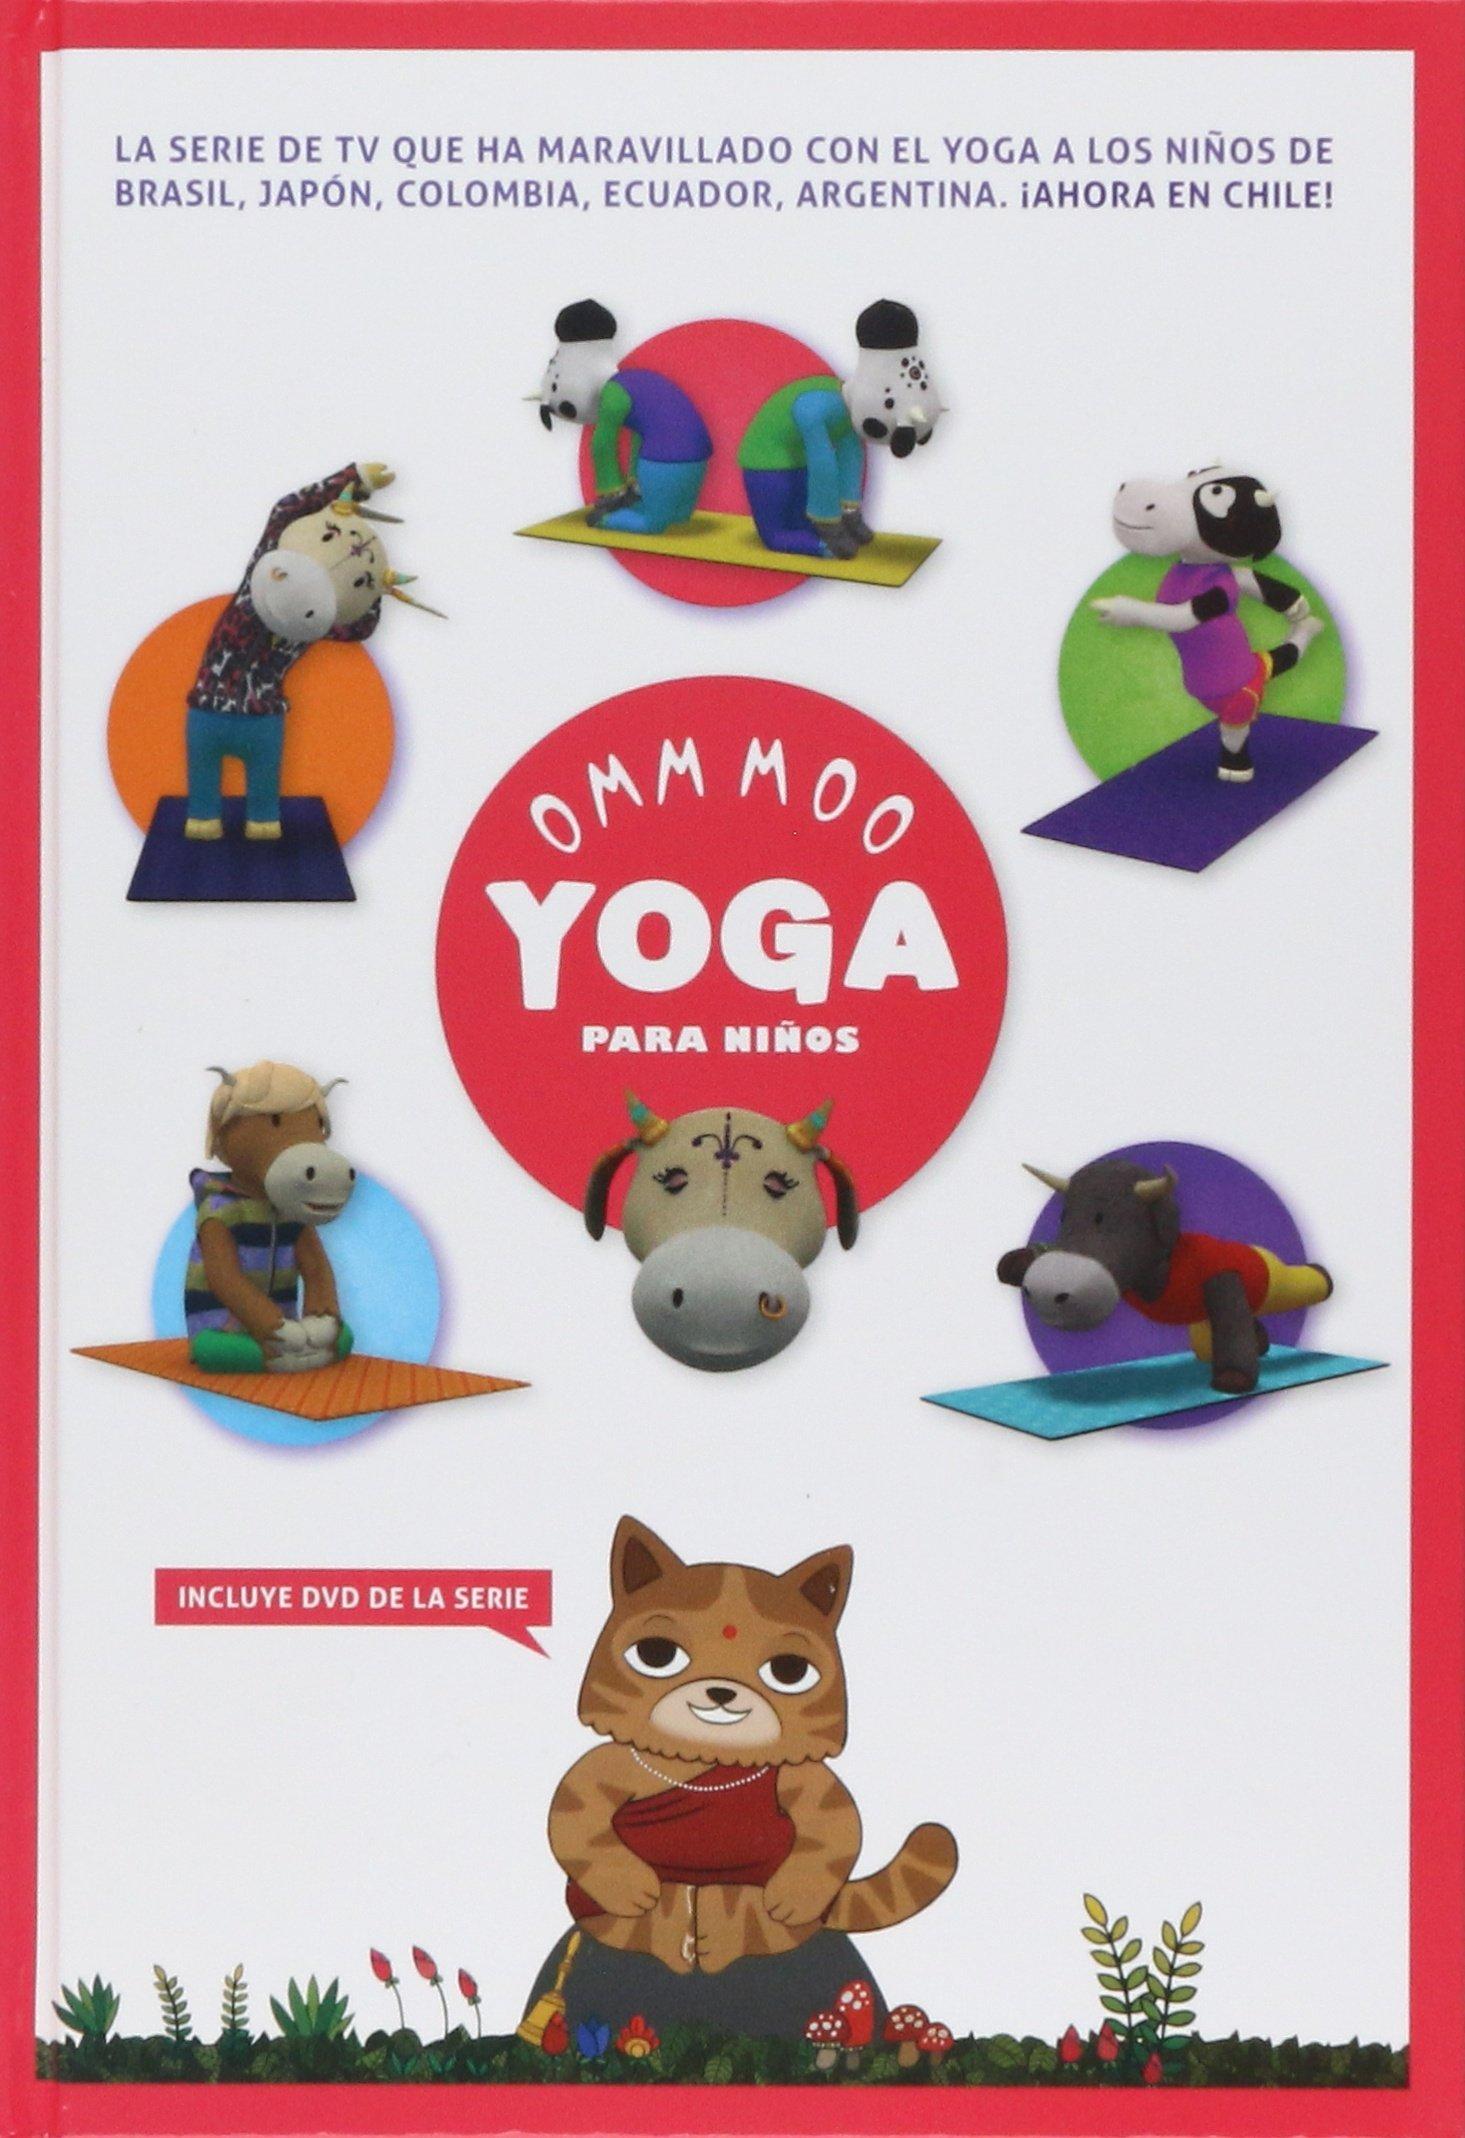 Amazon.com: Omm moo yoga para niños (9789569658006 ...